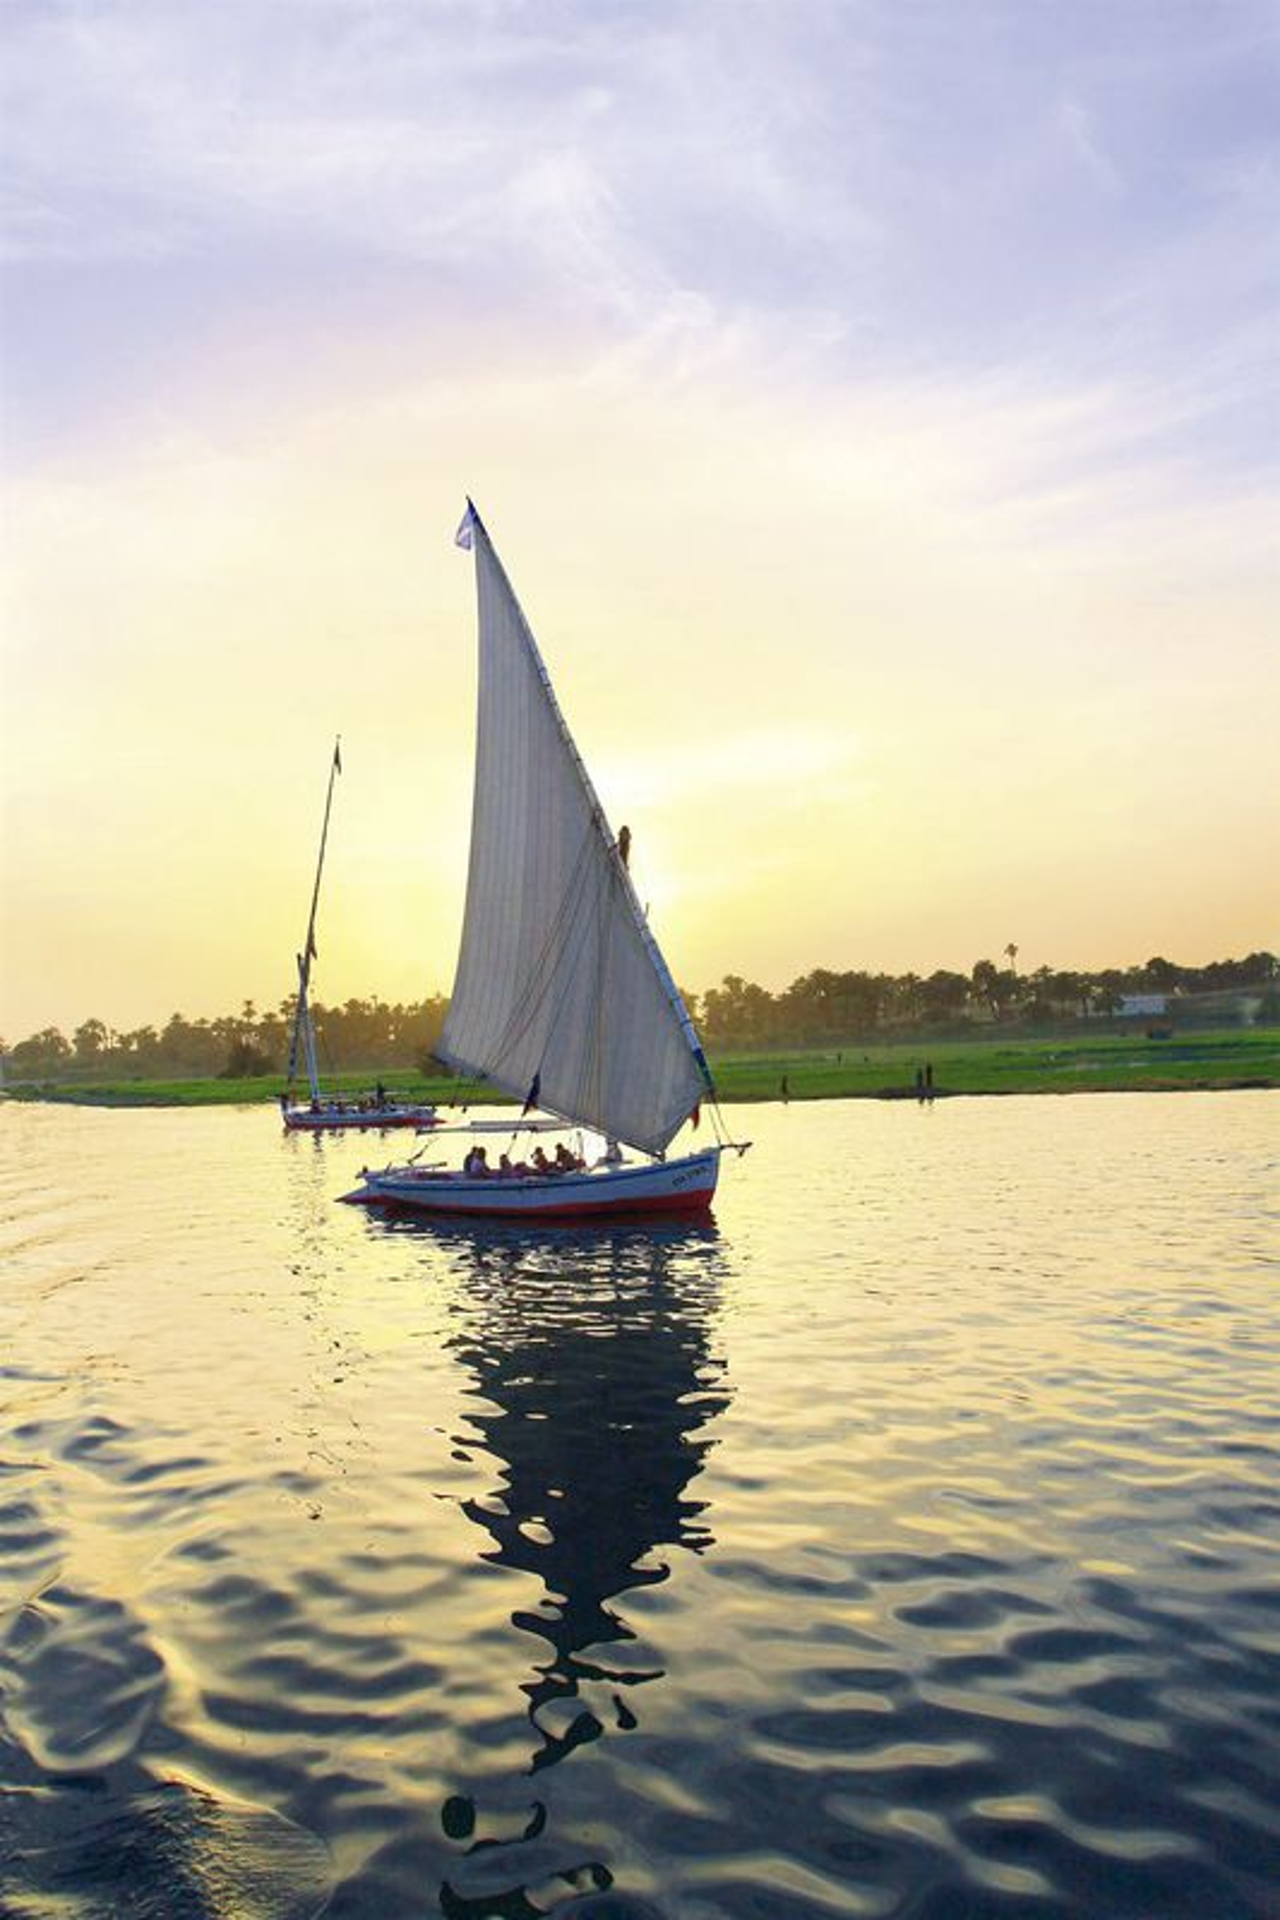 Felukke auf dem Nil